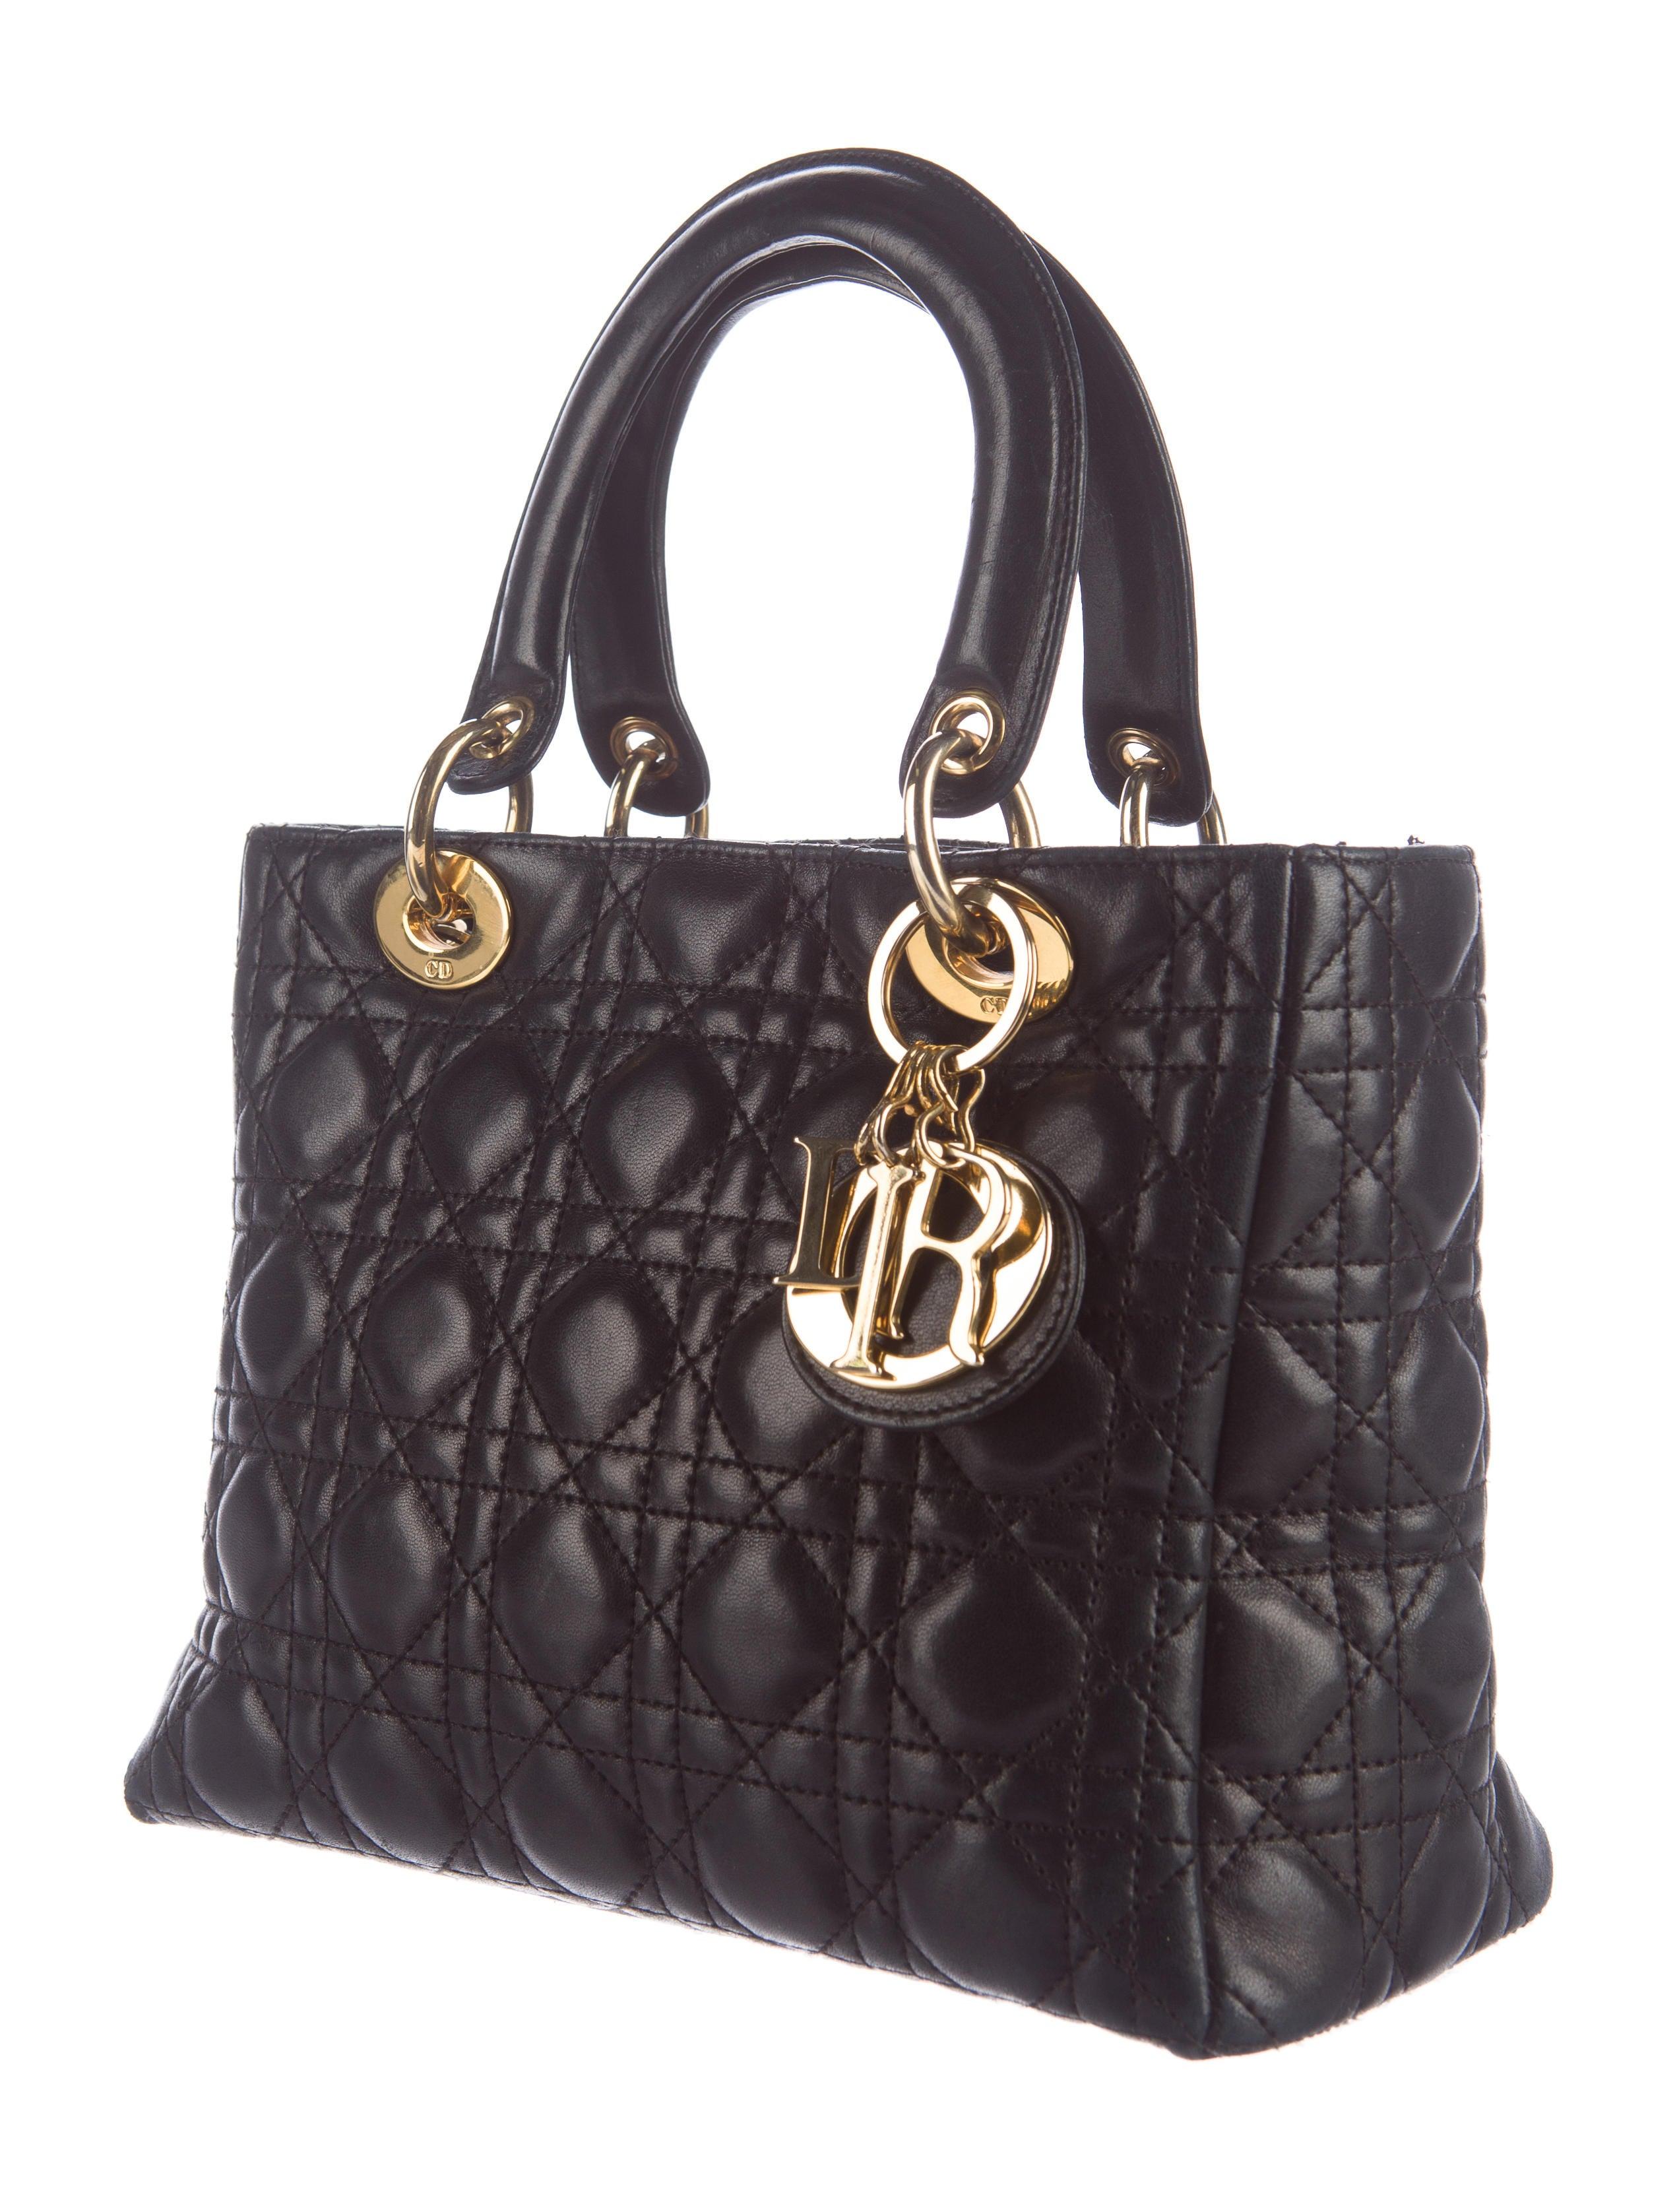 Christian Dior Medium Lady Dior Bag Handbags Chr53654